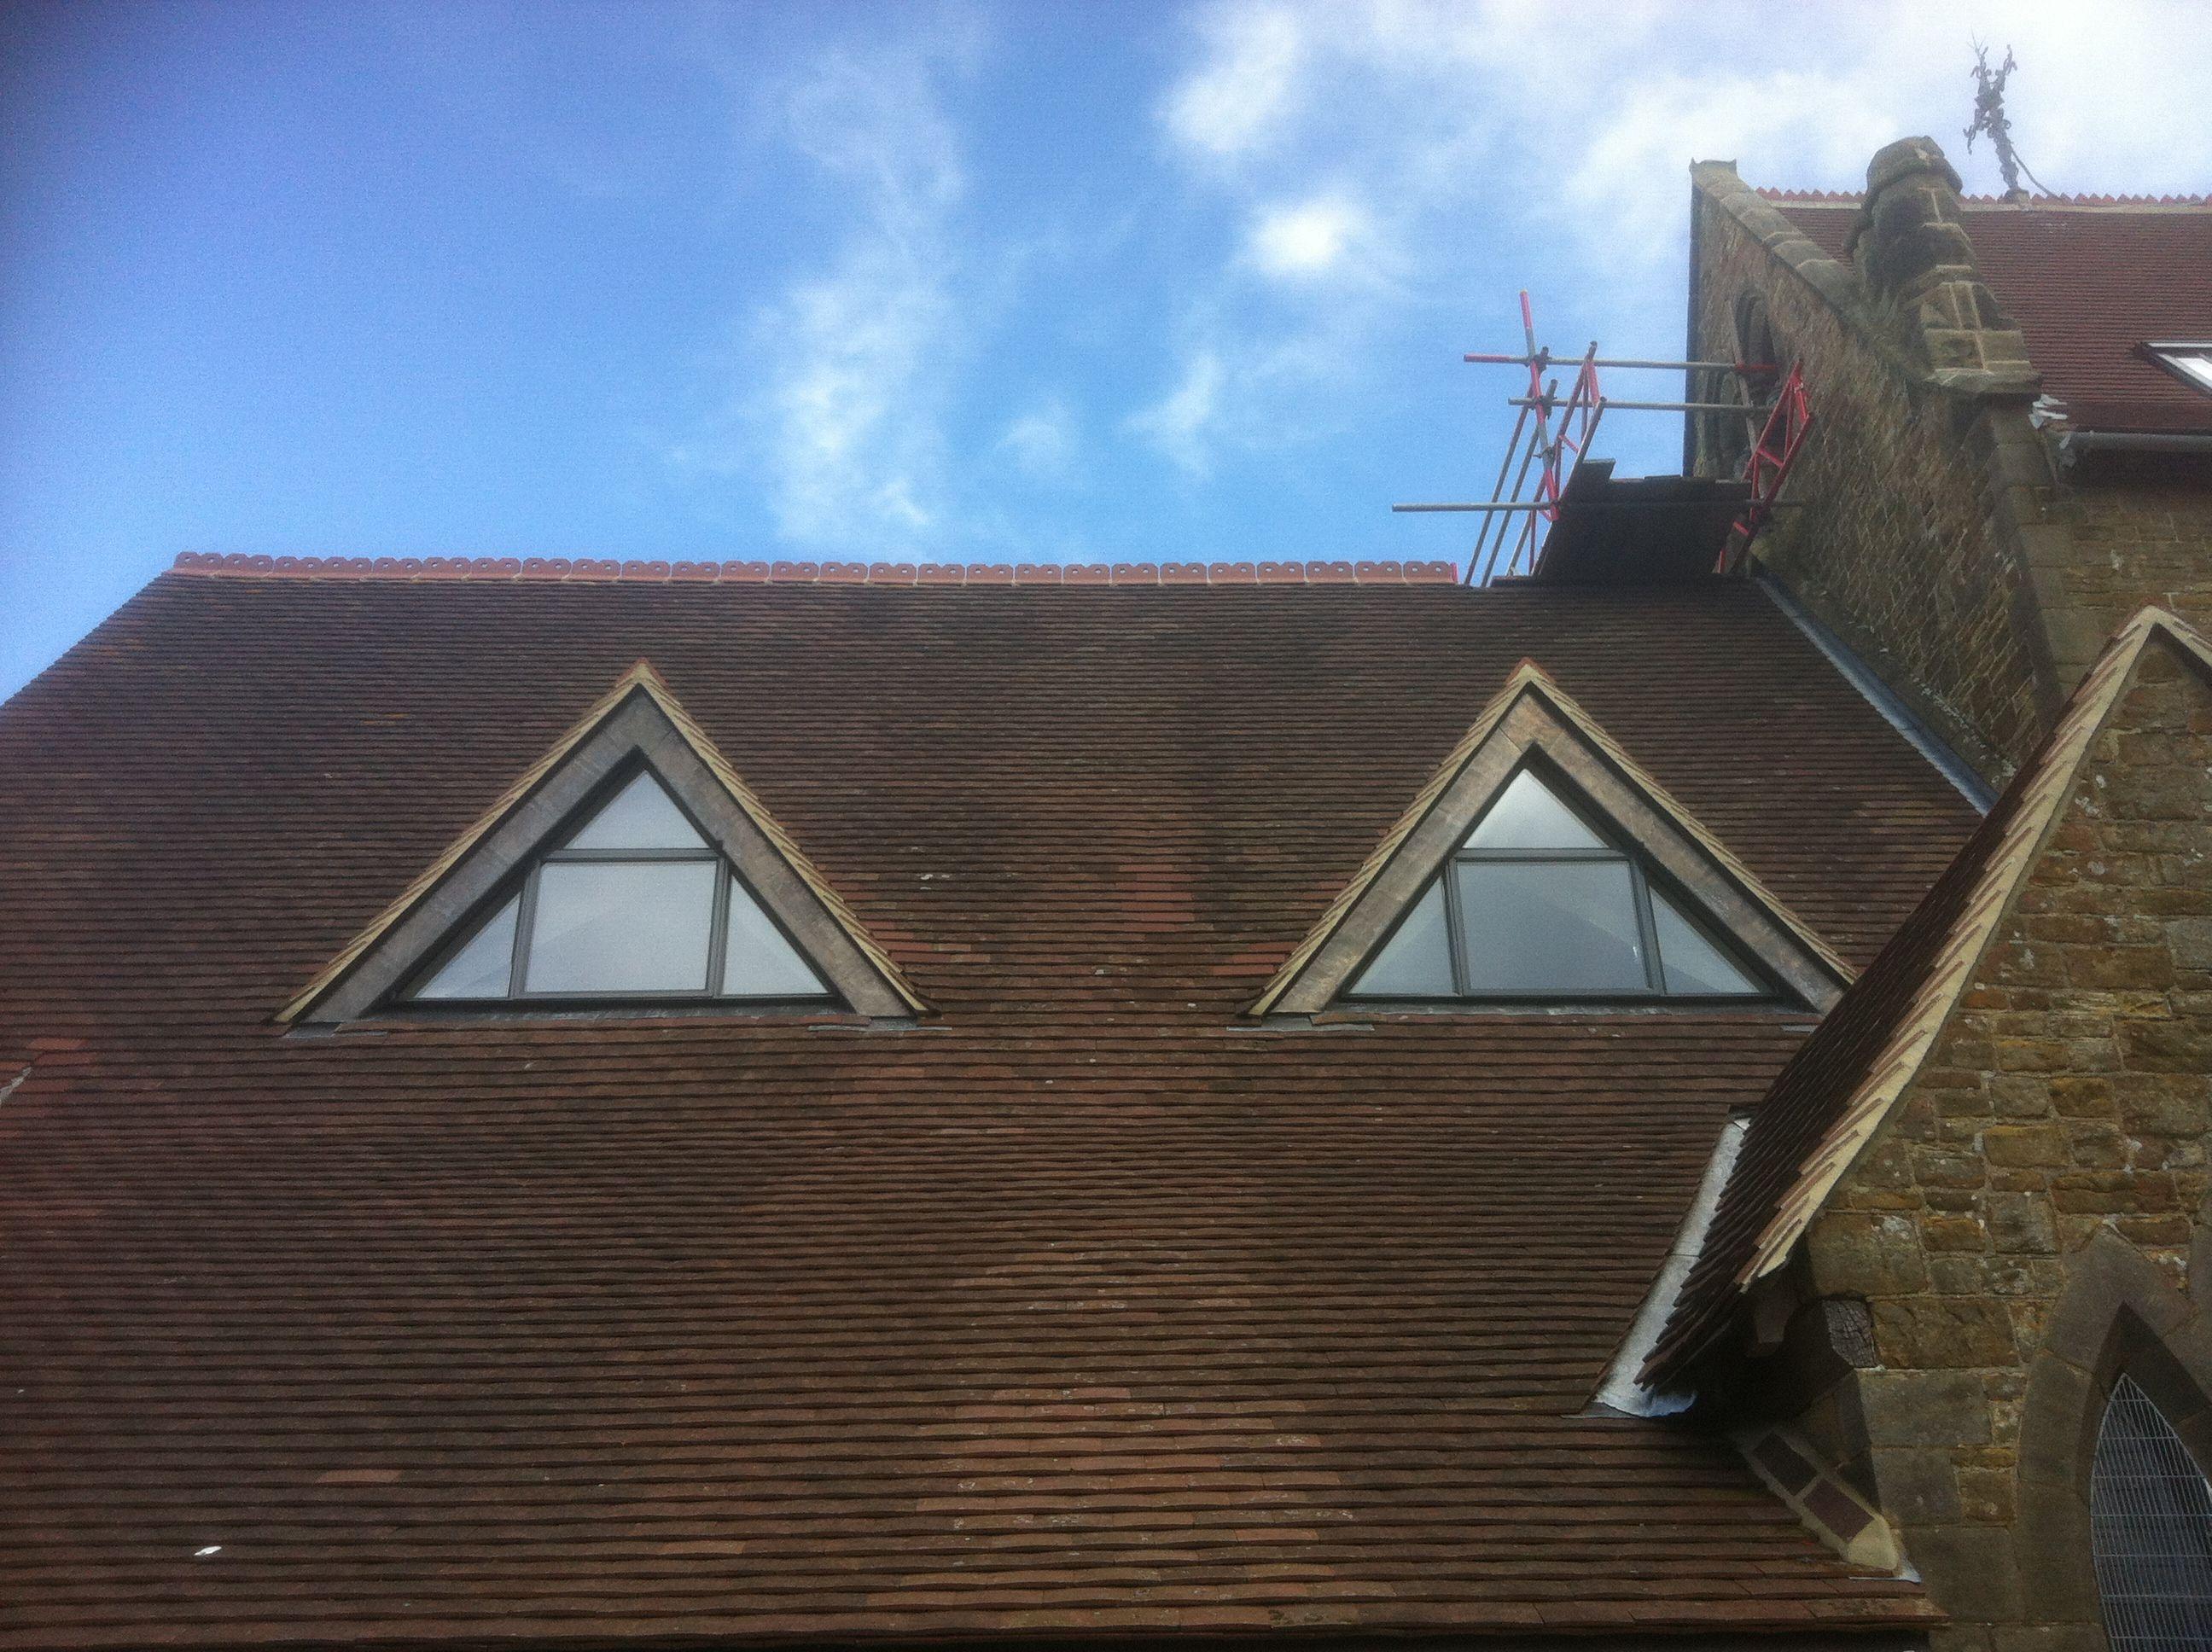 Triangle windows photos supplying wooden window shutters for - Black Steel Triangular Dormer Window With Vent Steelwindow Traditionalstylewindows Ag210